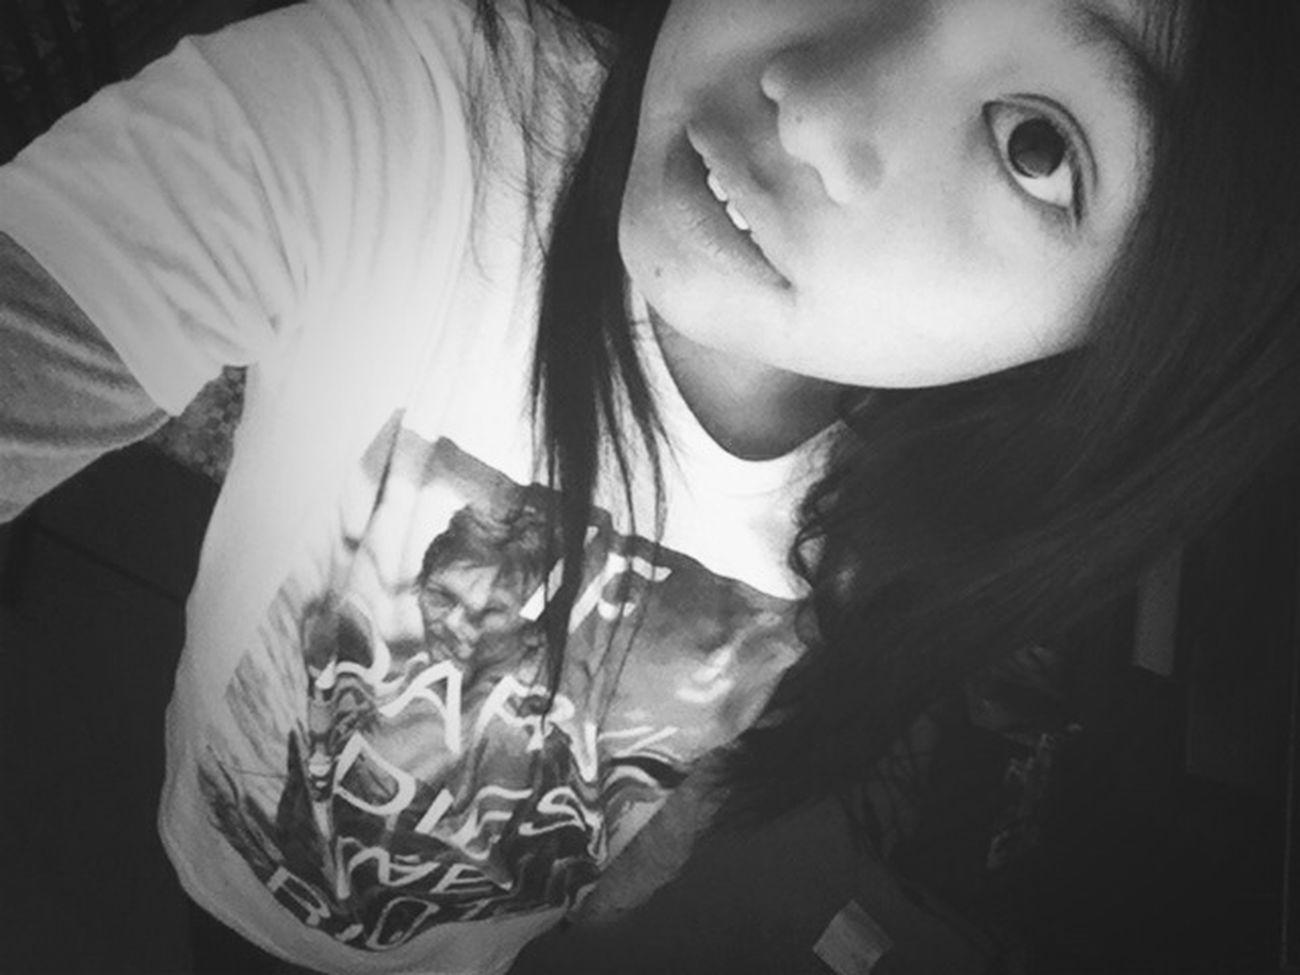 Selfie Walking Dead Shirt Daryl Dixon